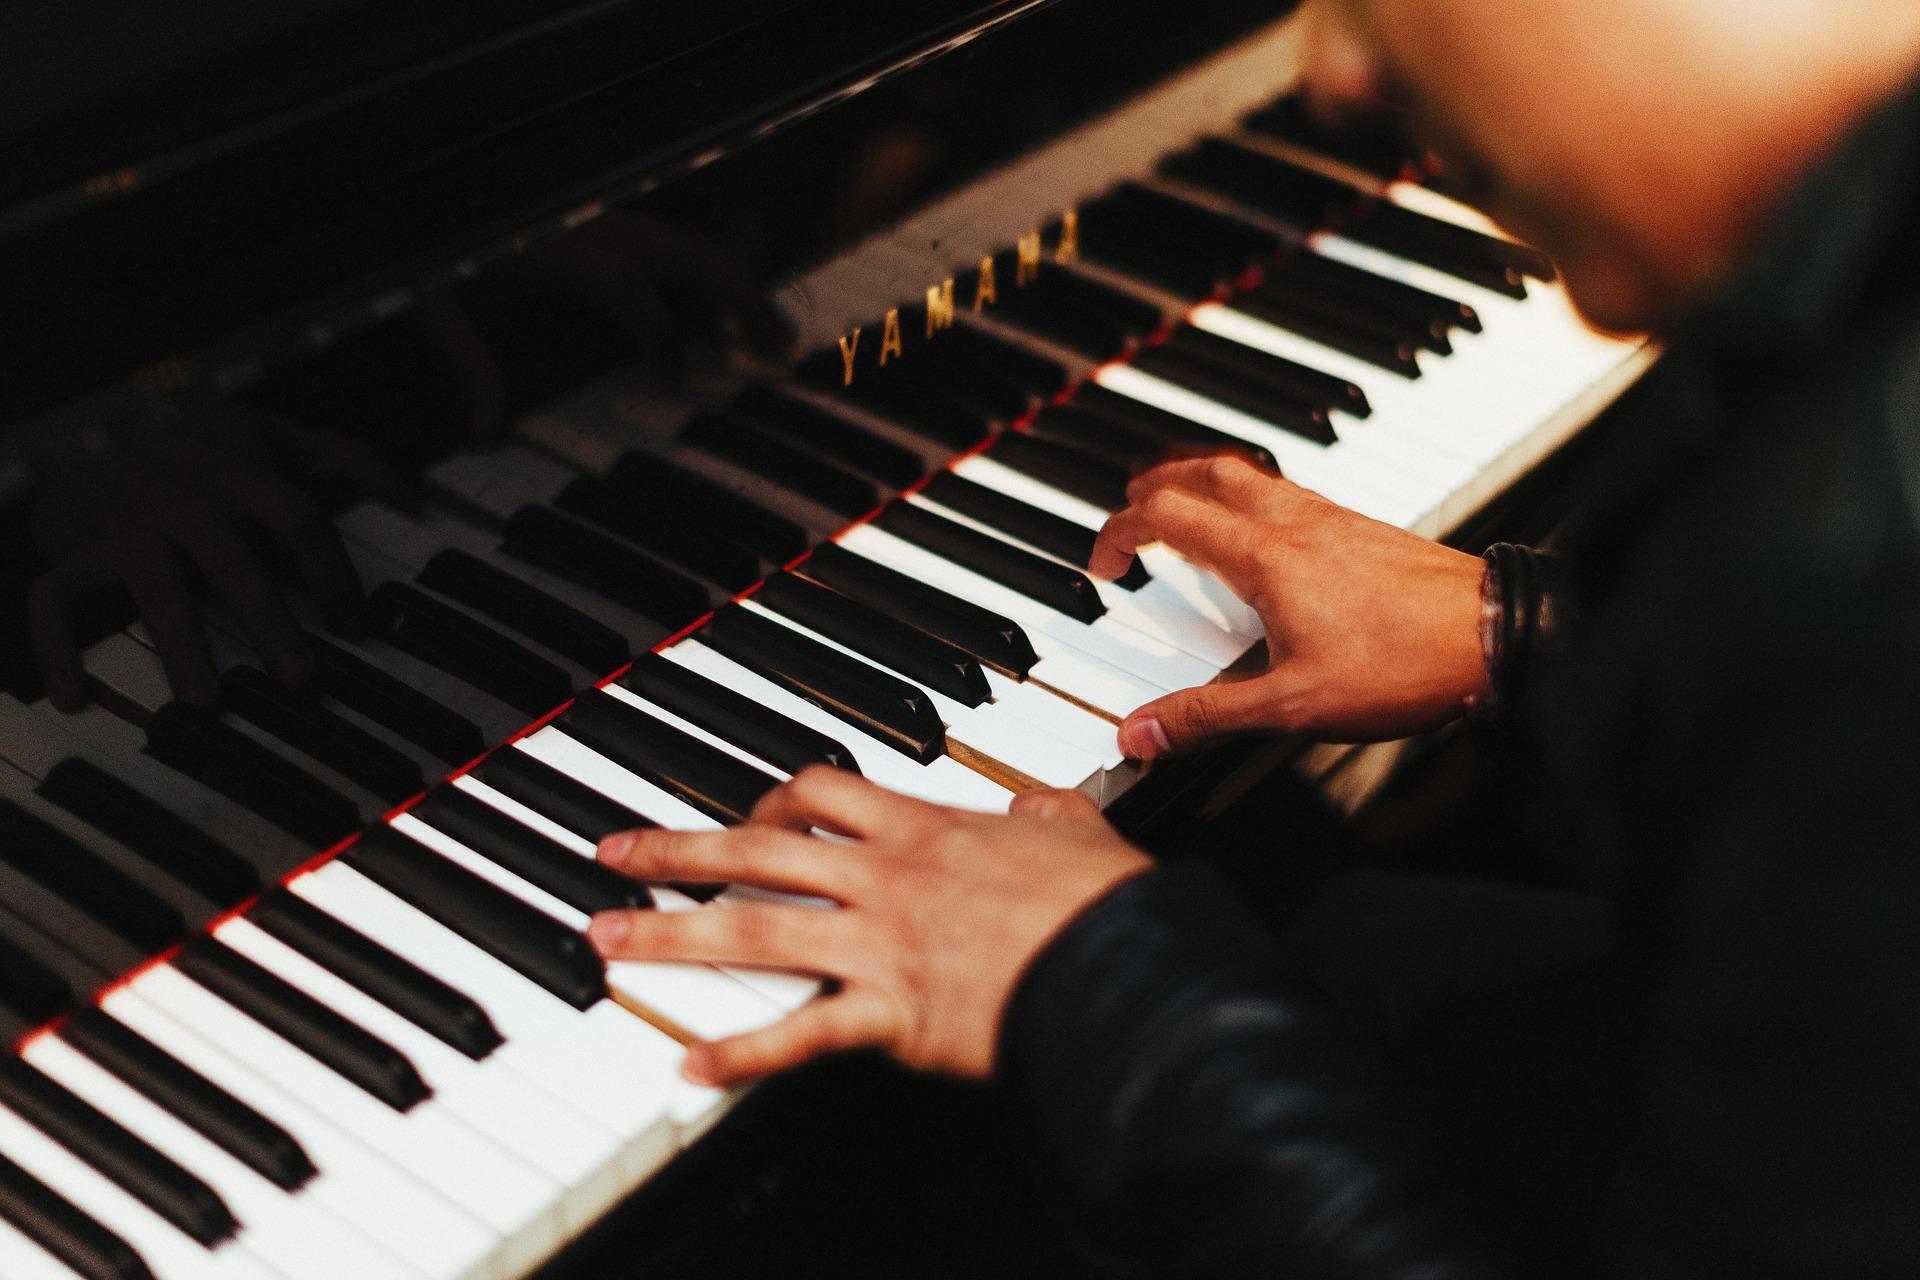 pianist-1149172_1920